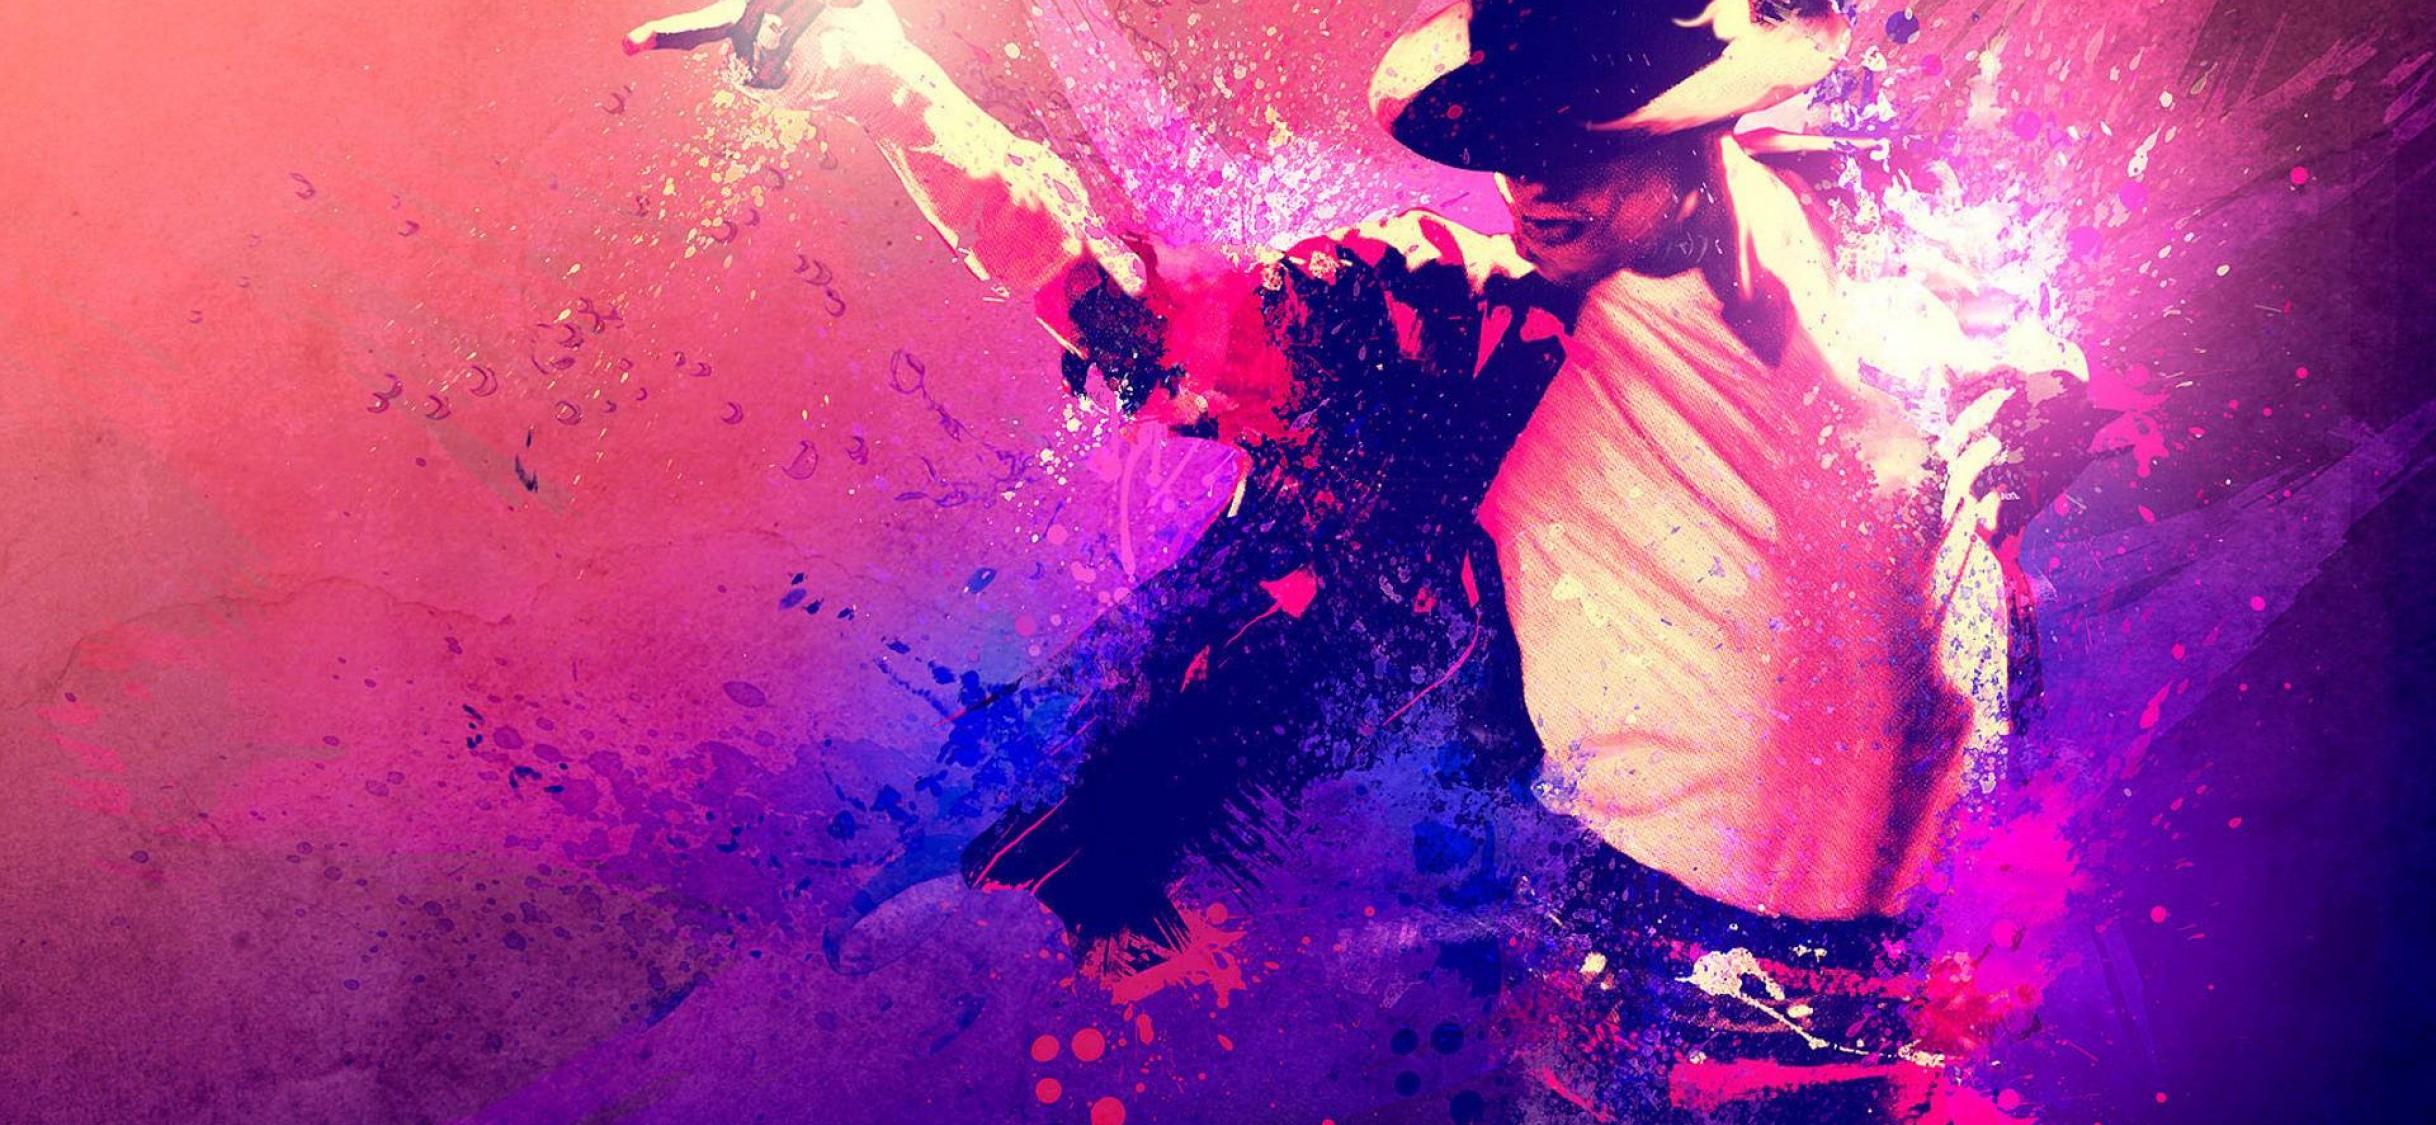 Michael Jackson Full Hd Wallpaper For Desktop And Mobiles